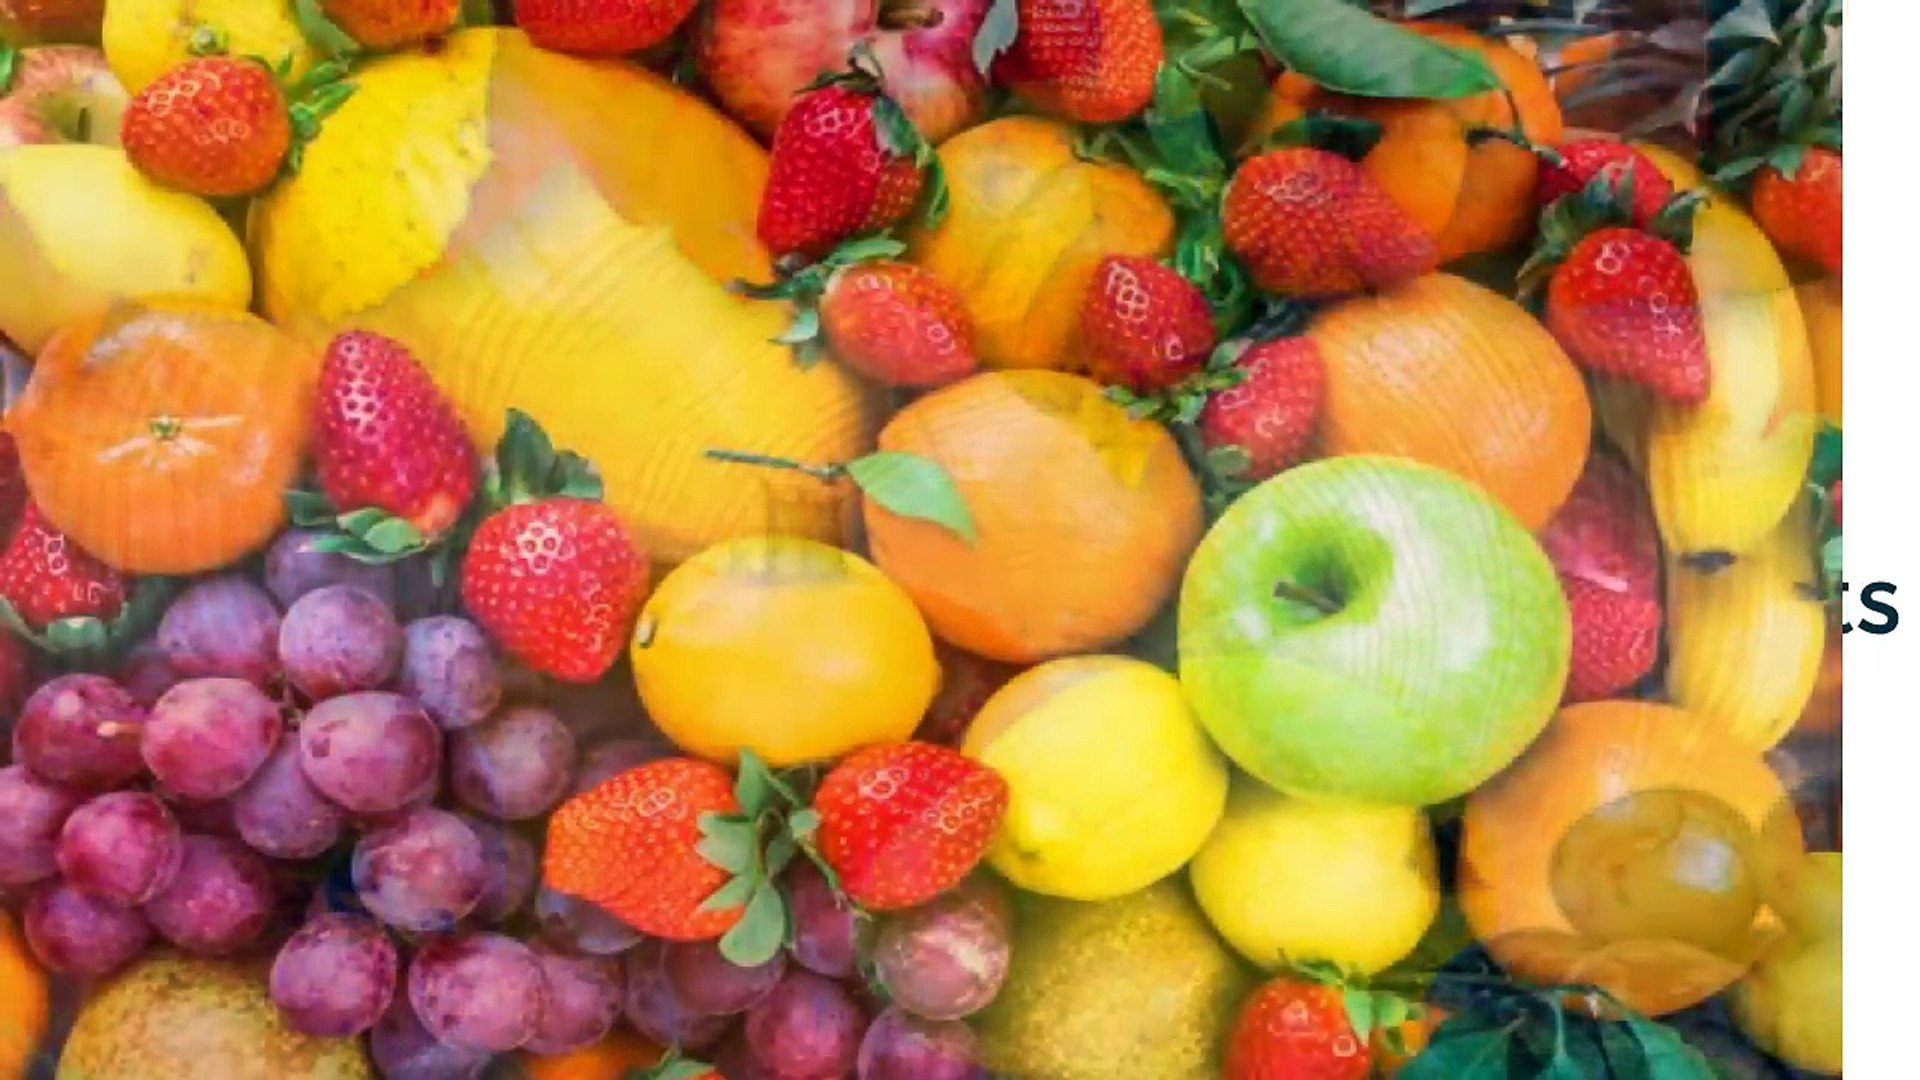 Diet Plan - DIET FOOD_ LOSS 10 POUNDS IN A WEEK